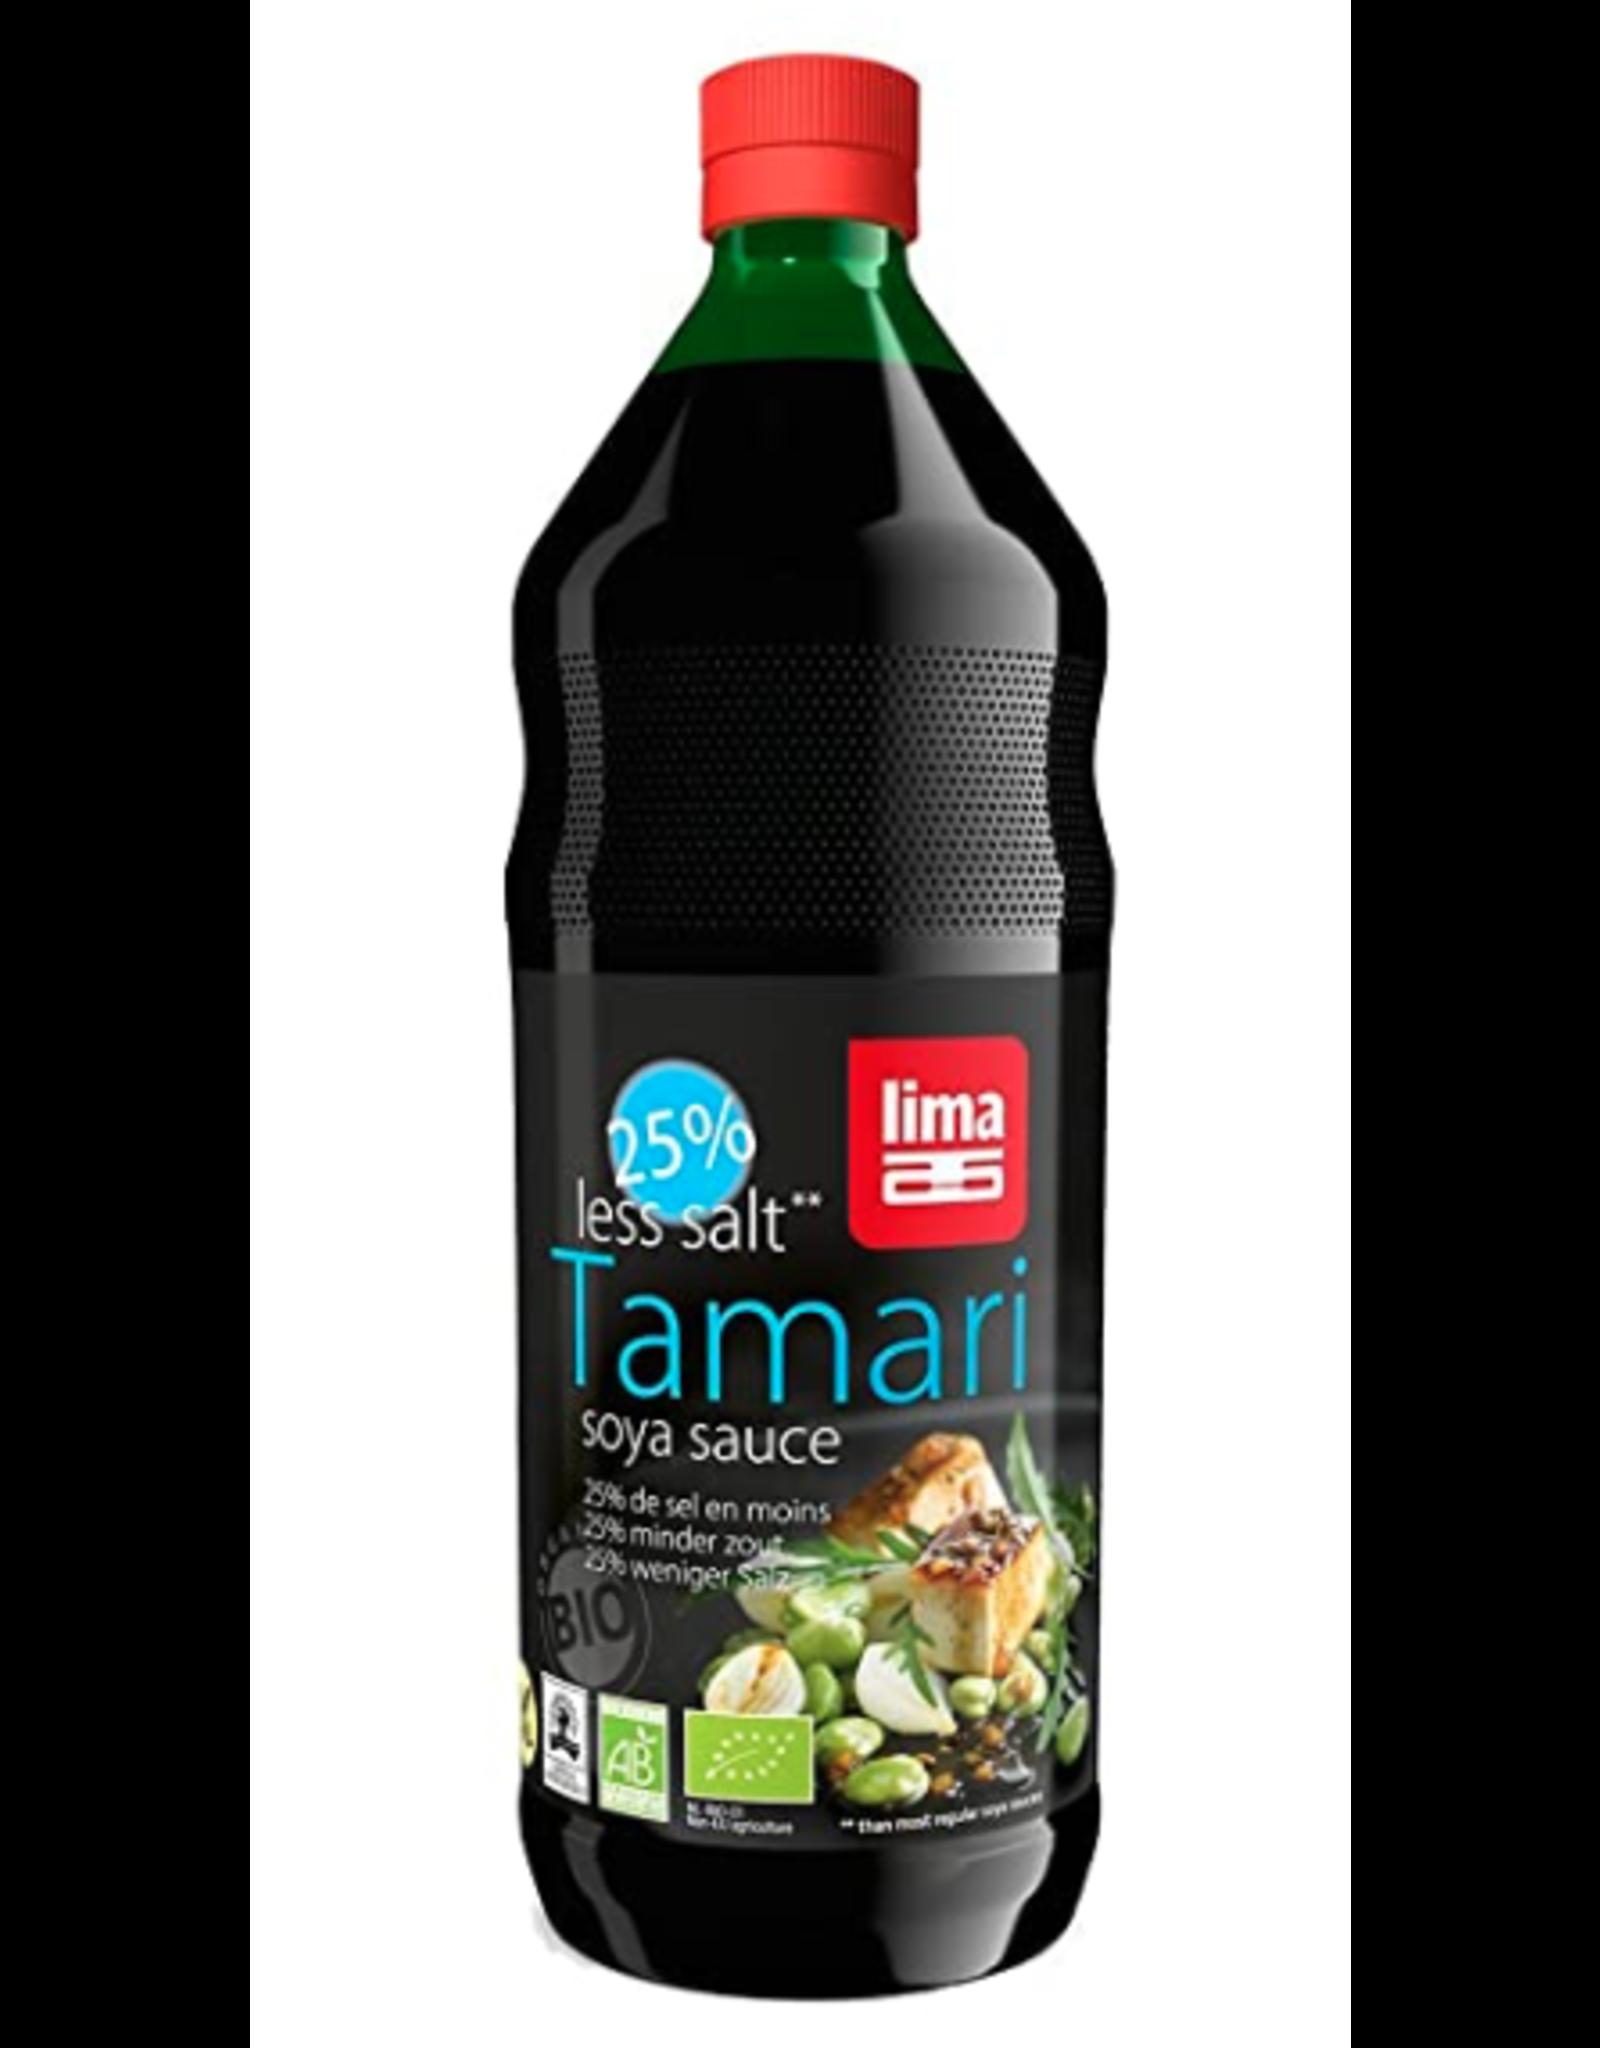 Lima Tamari 25% menos sal, 1000ml